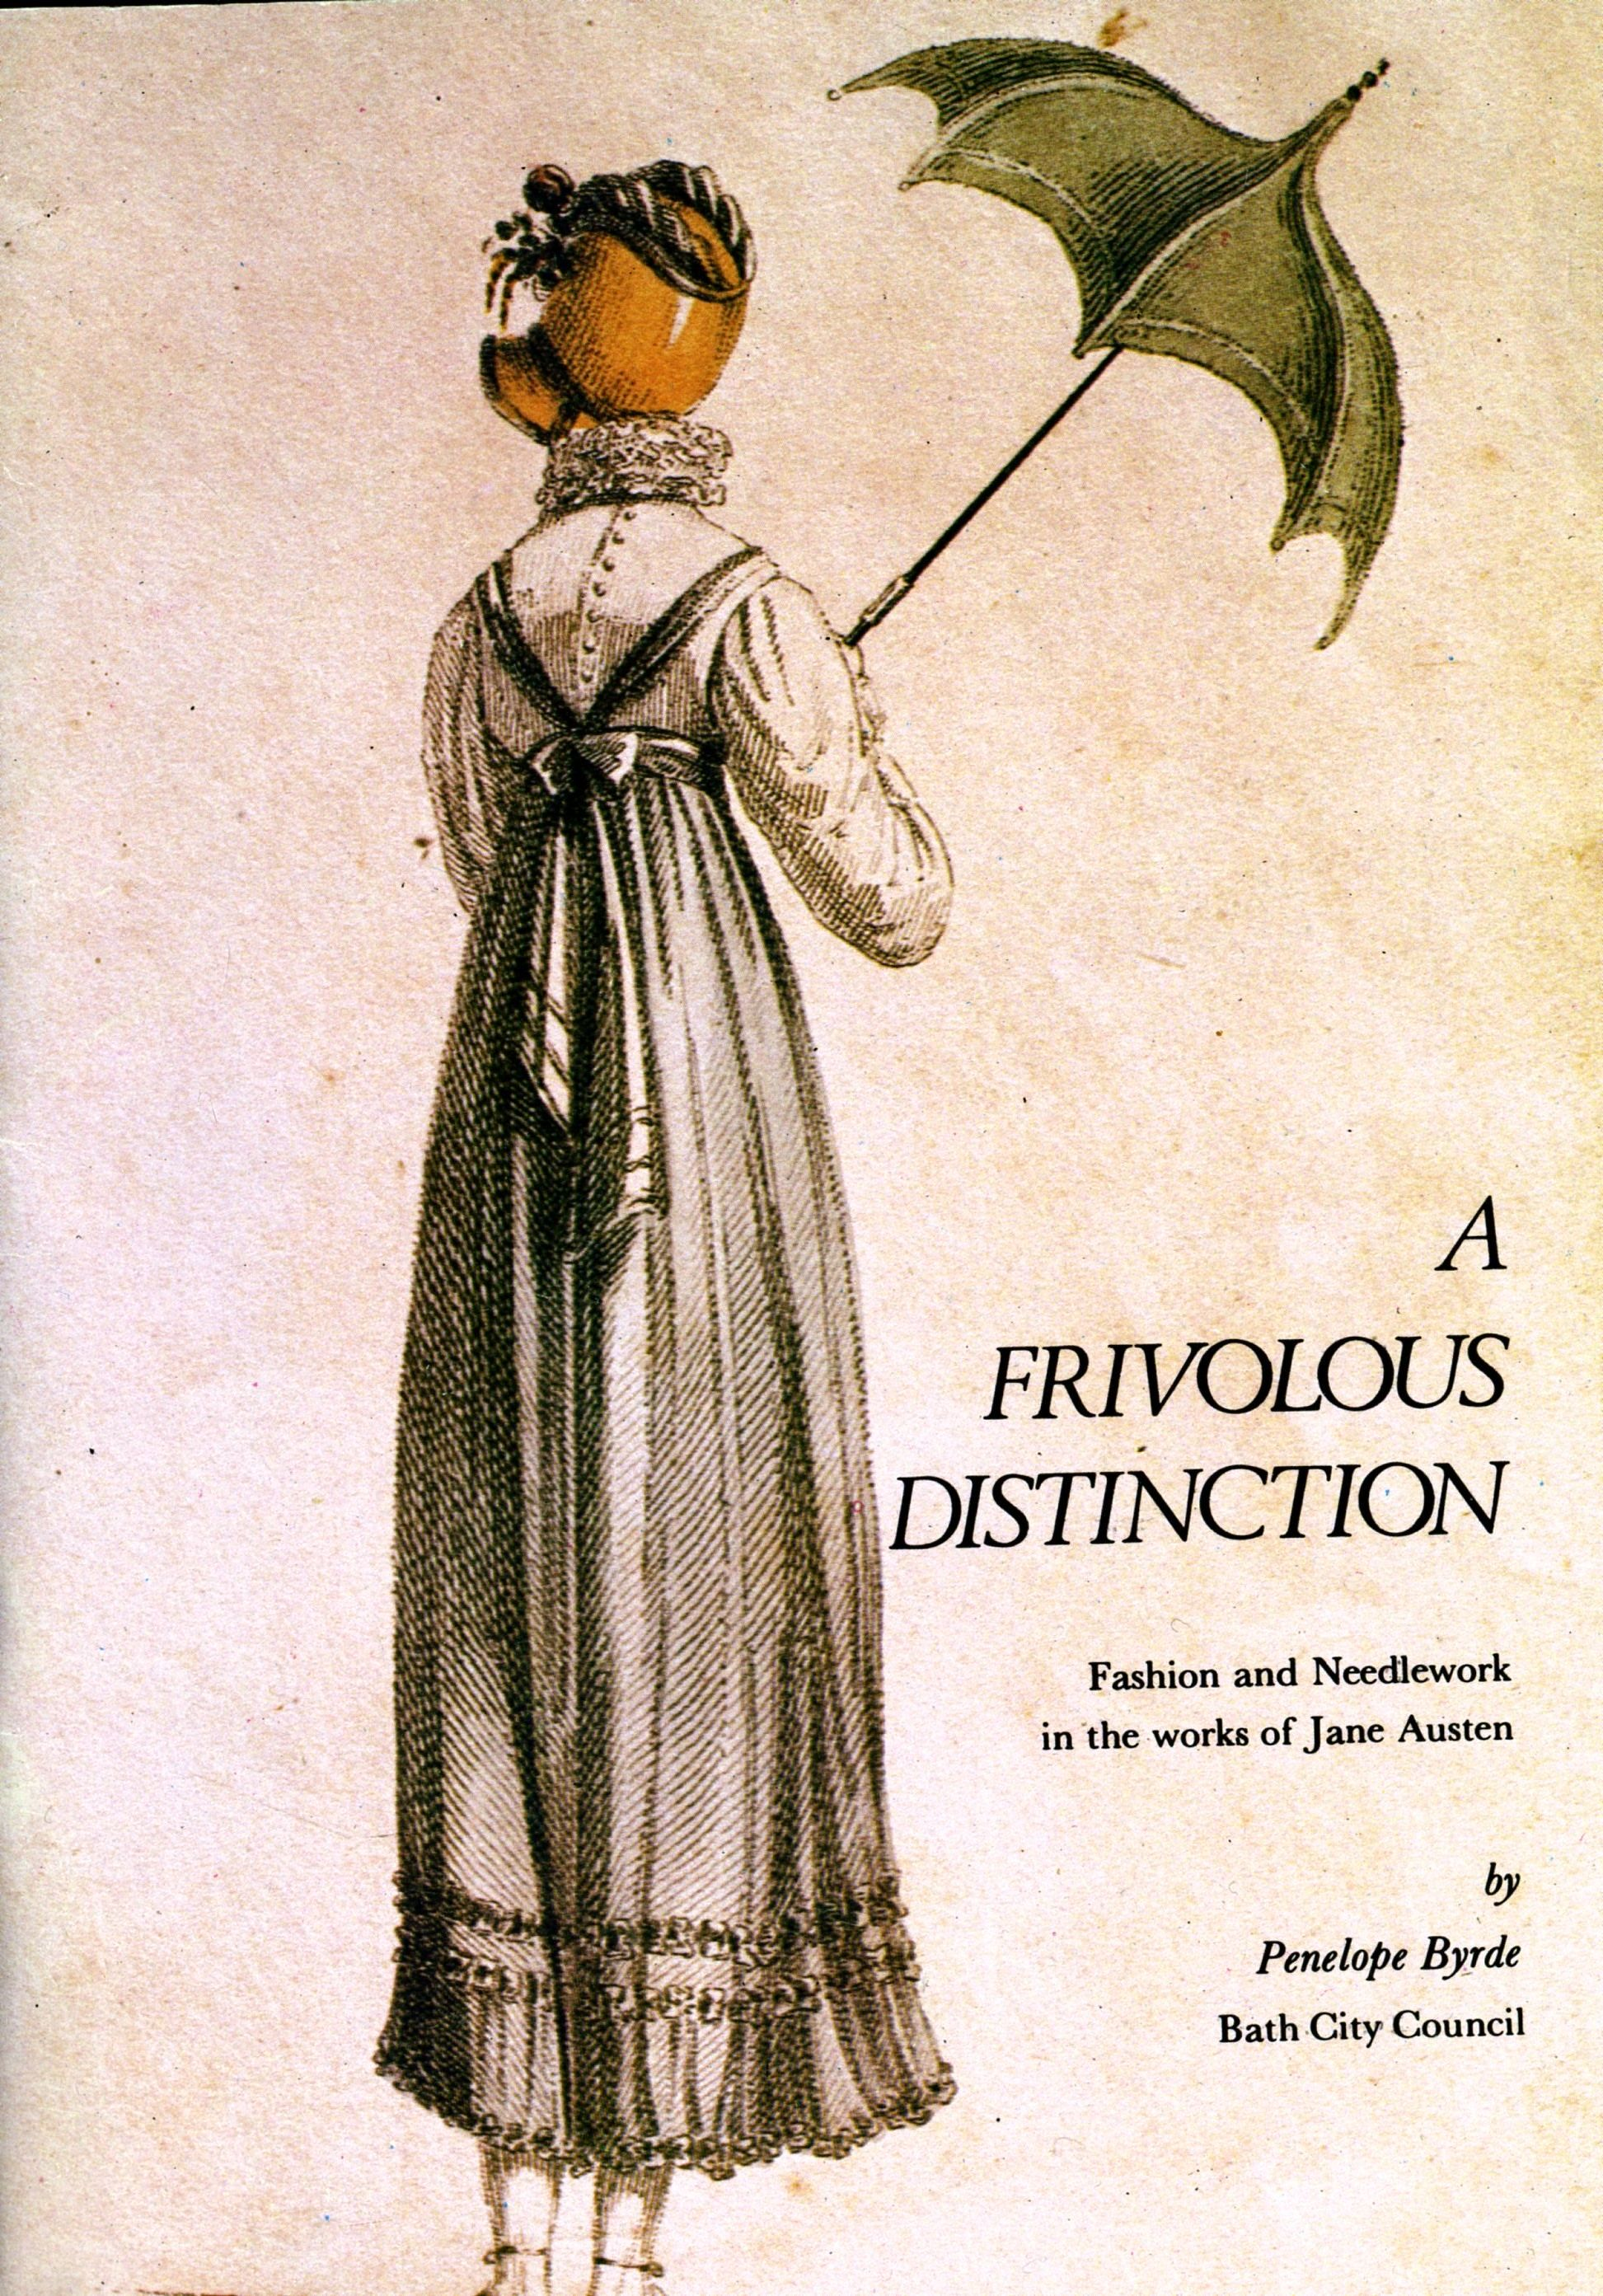 A Frivolous Disctinction : Jane Austen fashion